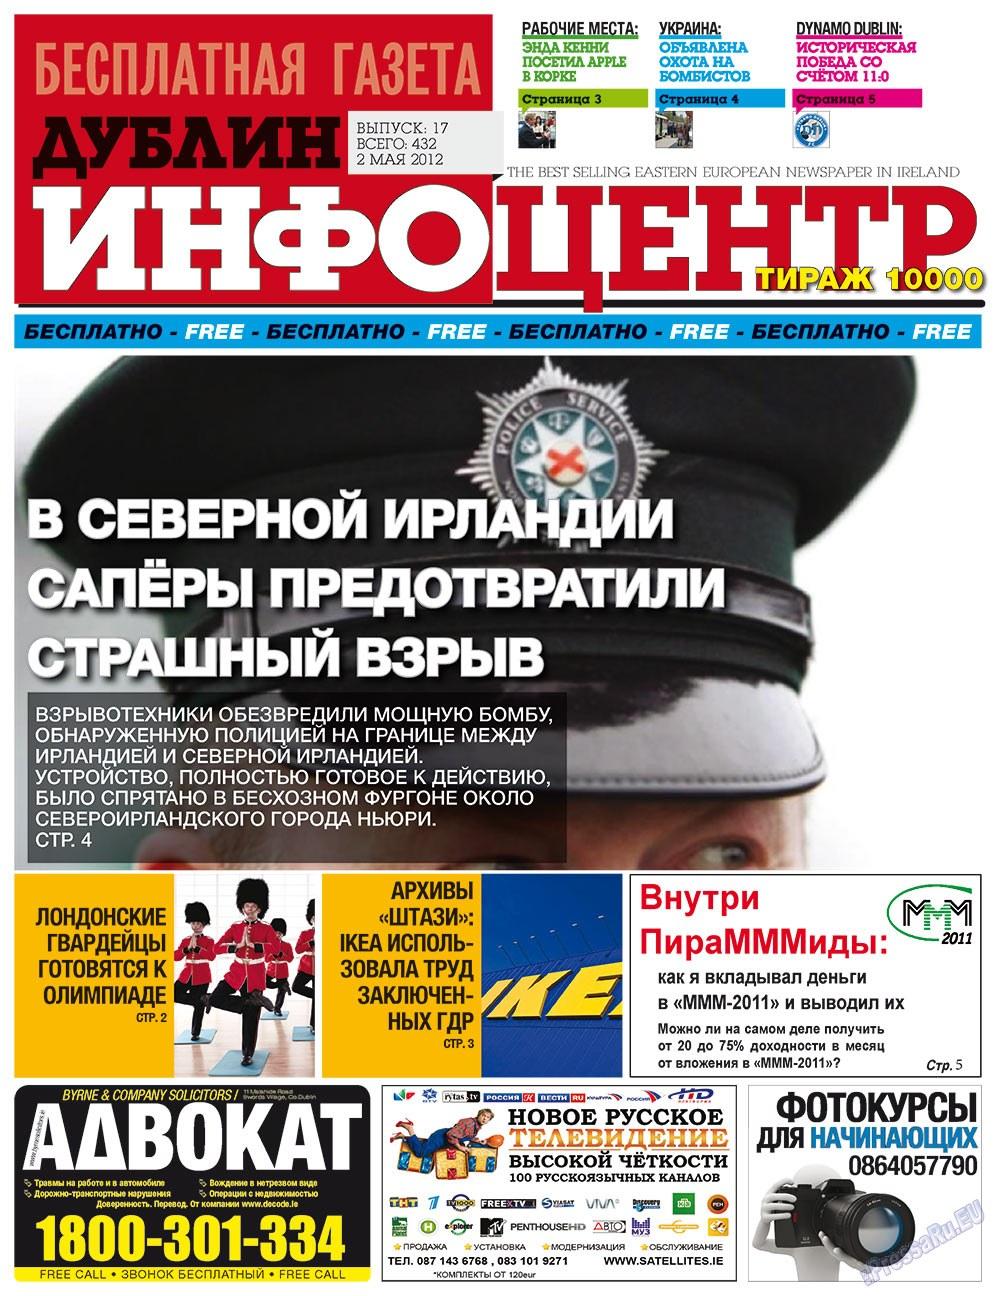 Дублин инфоцентр (газета). 2012 год, номер 17, стр. 1